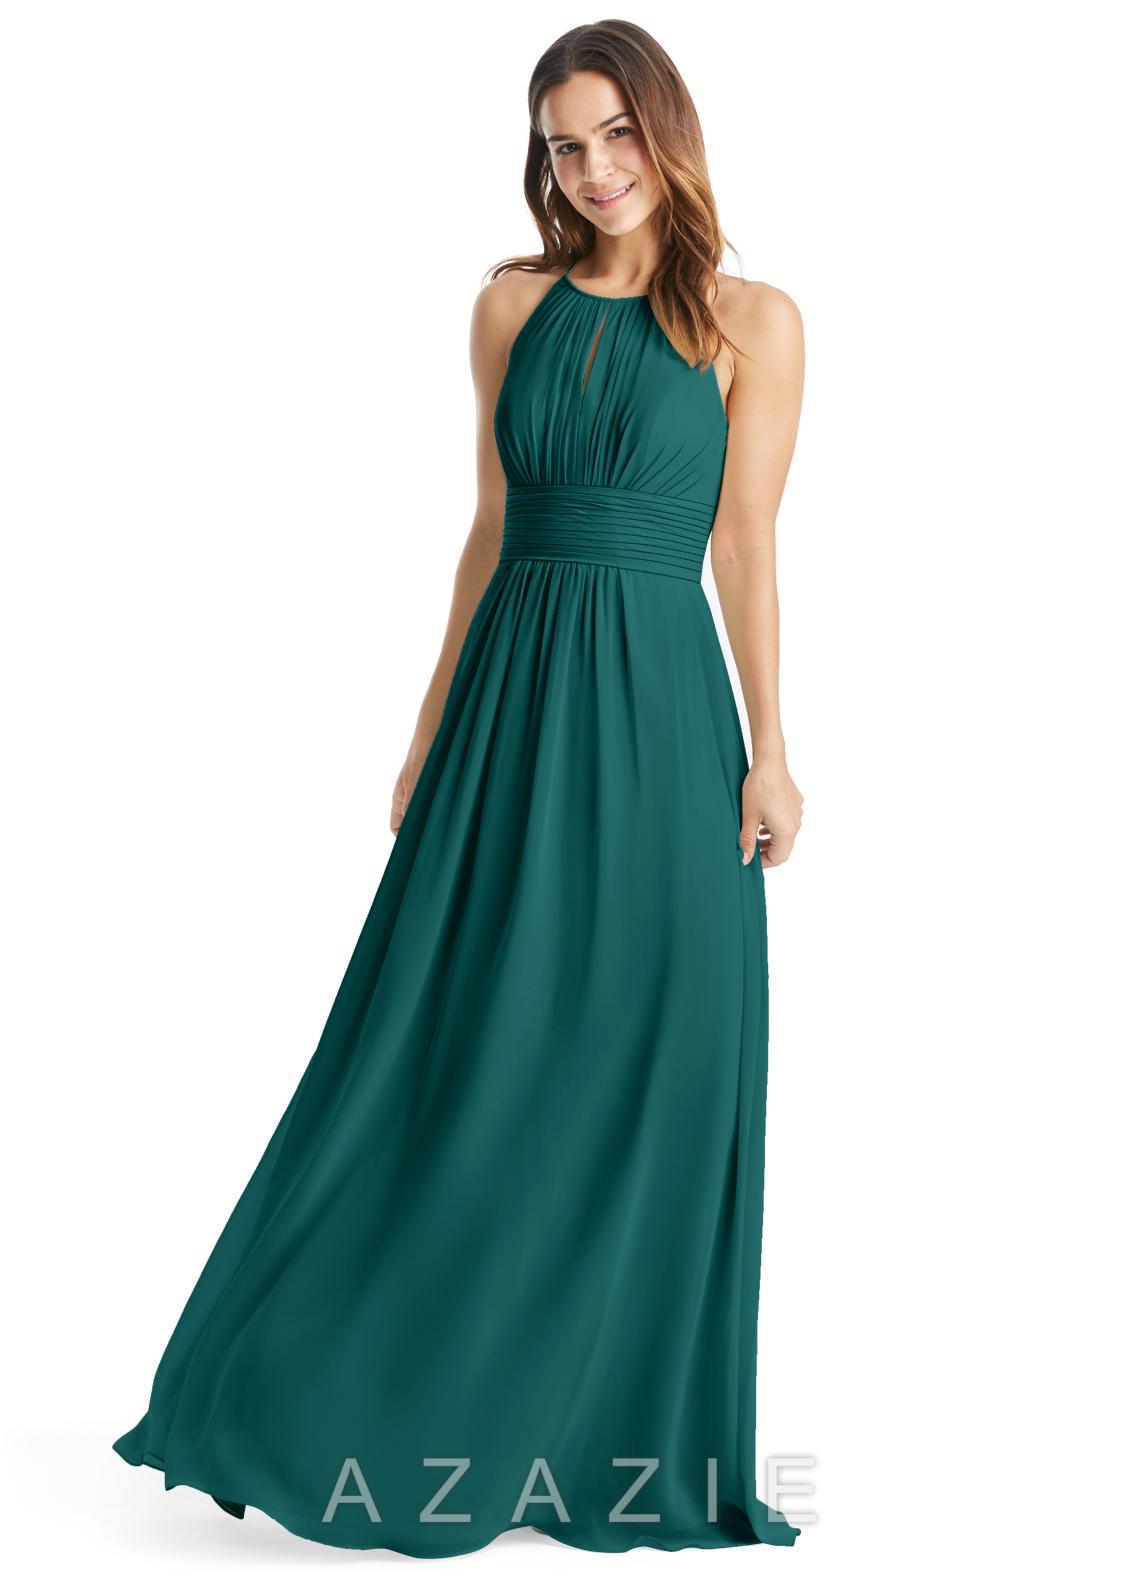 b87c96560bf Azazie Bonnie Bridesmaid Dress - Peacock